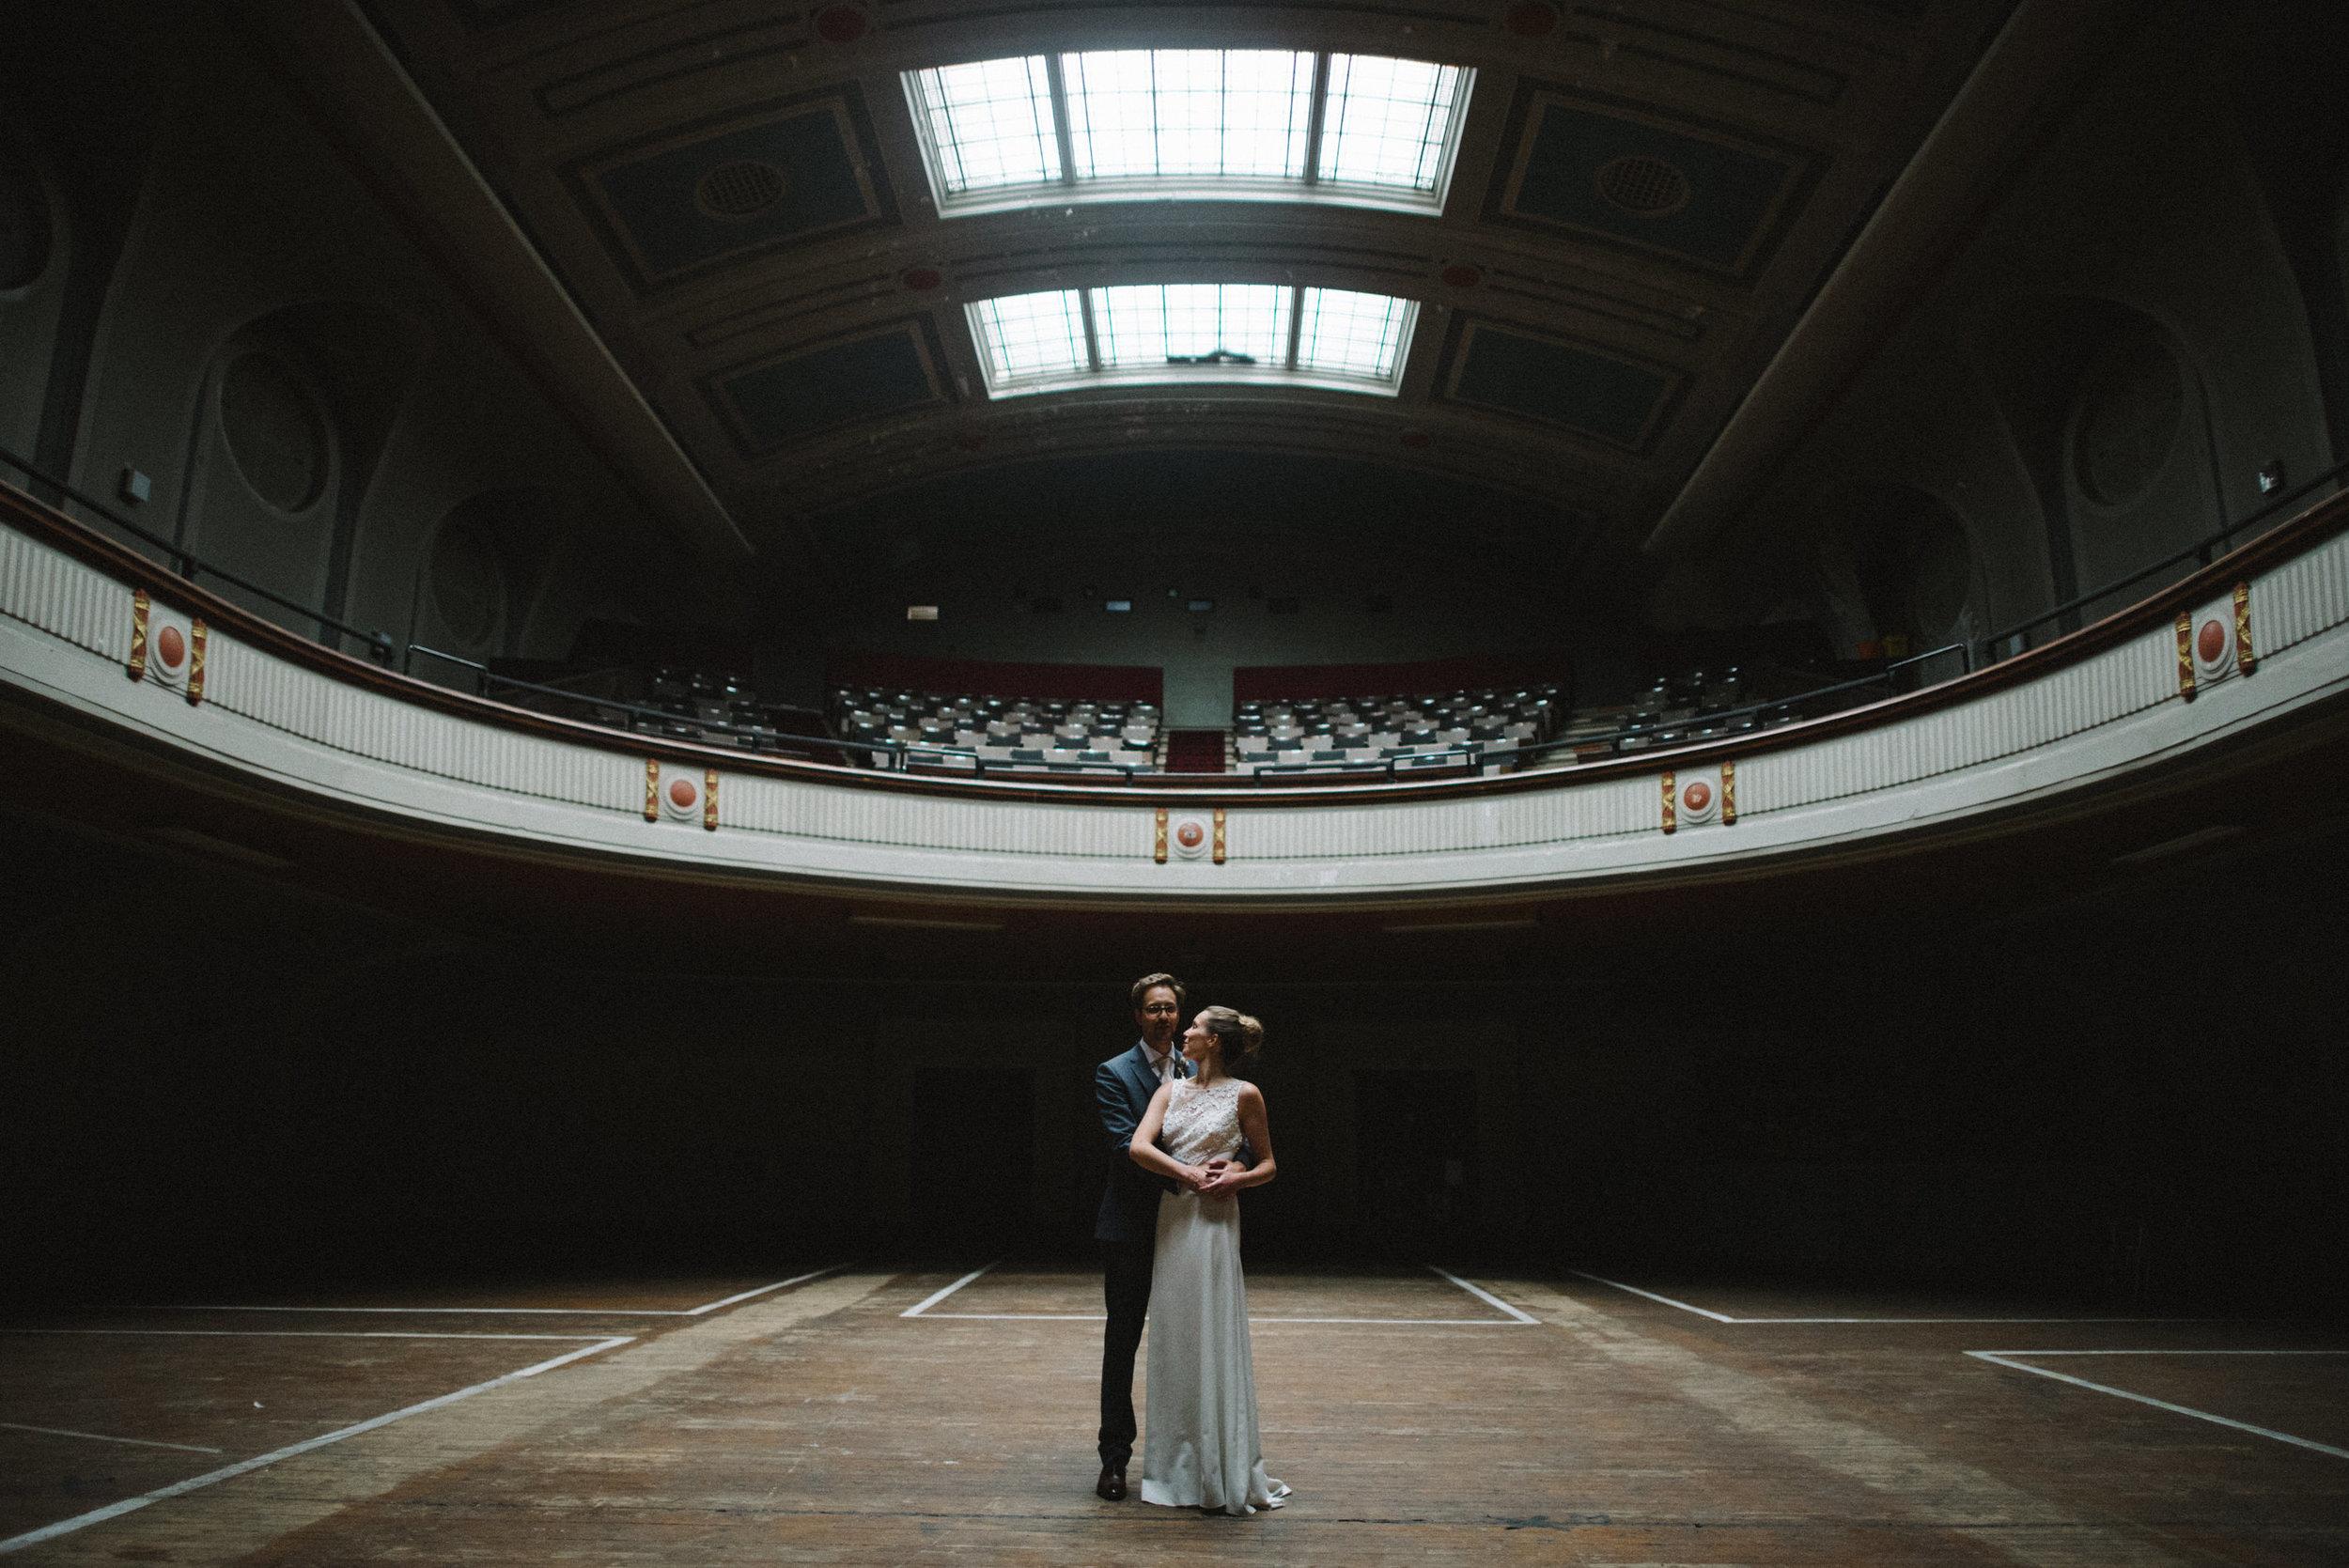 0122-LISA-DEVINE-PHOTOGRAPHY-ALTERNATIVE-WEDDING-PHOTOGRAPHY-SCOTLAND-DESTINATION-WEDDINGS-GLASGOW-WEDDINGS-COOL-WEDDINGS-STYLISH-WEDDINGS.JPG